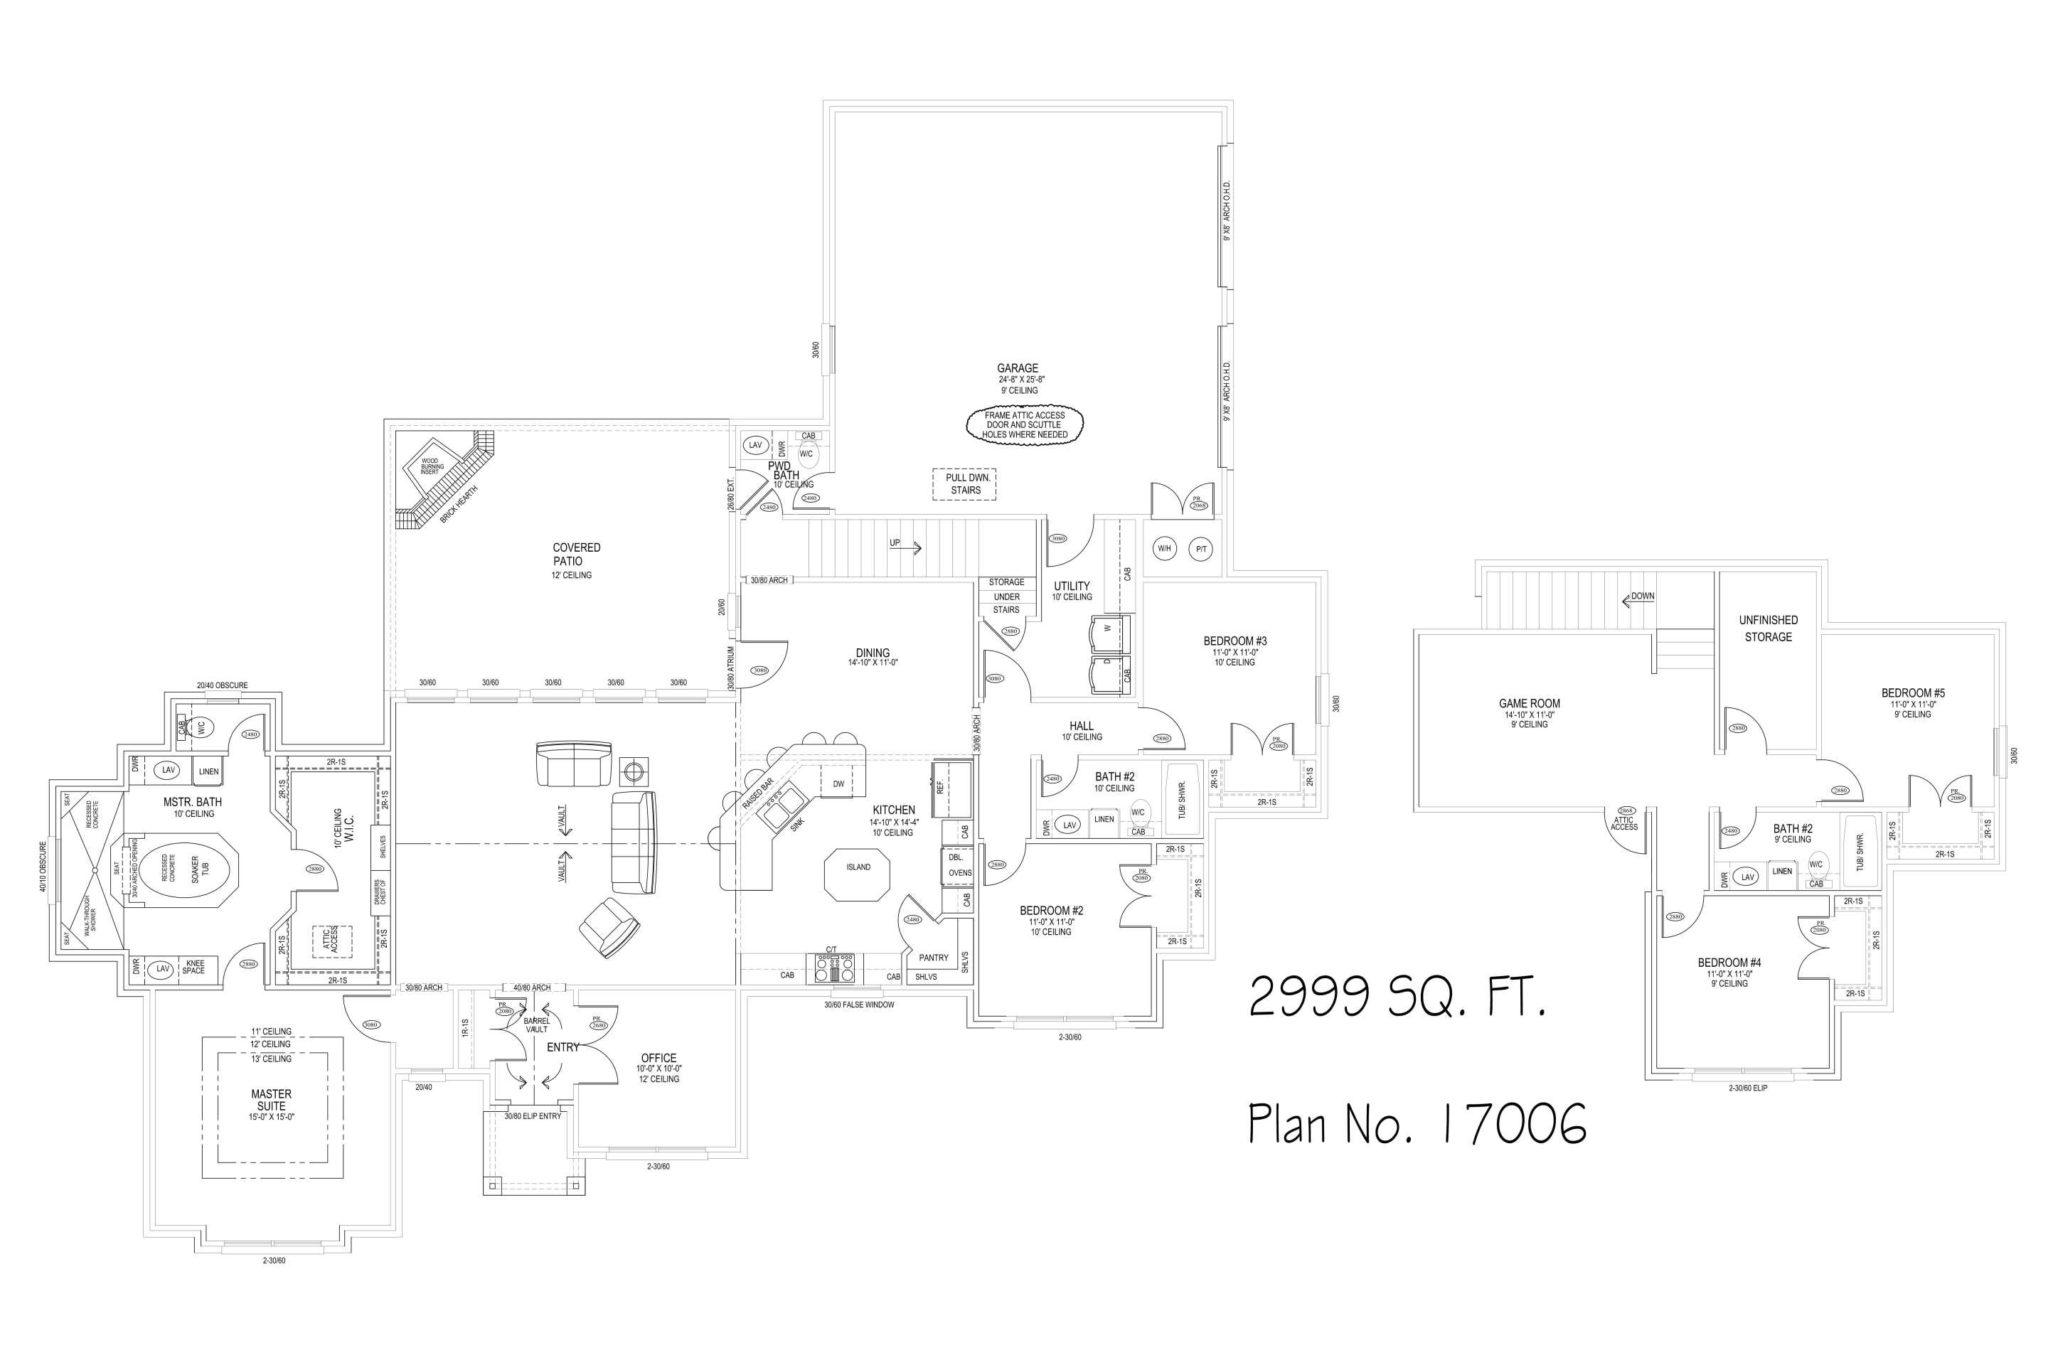 house-plan-17006-floor